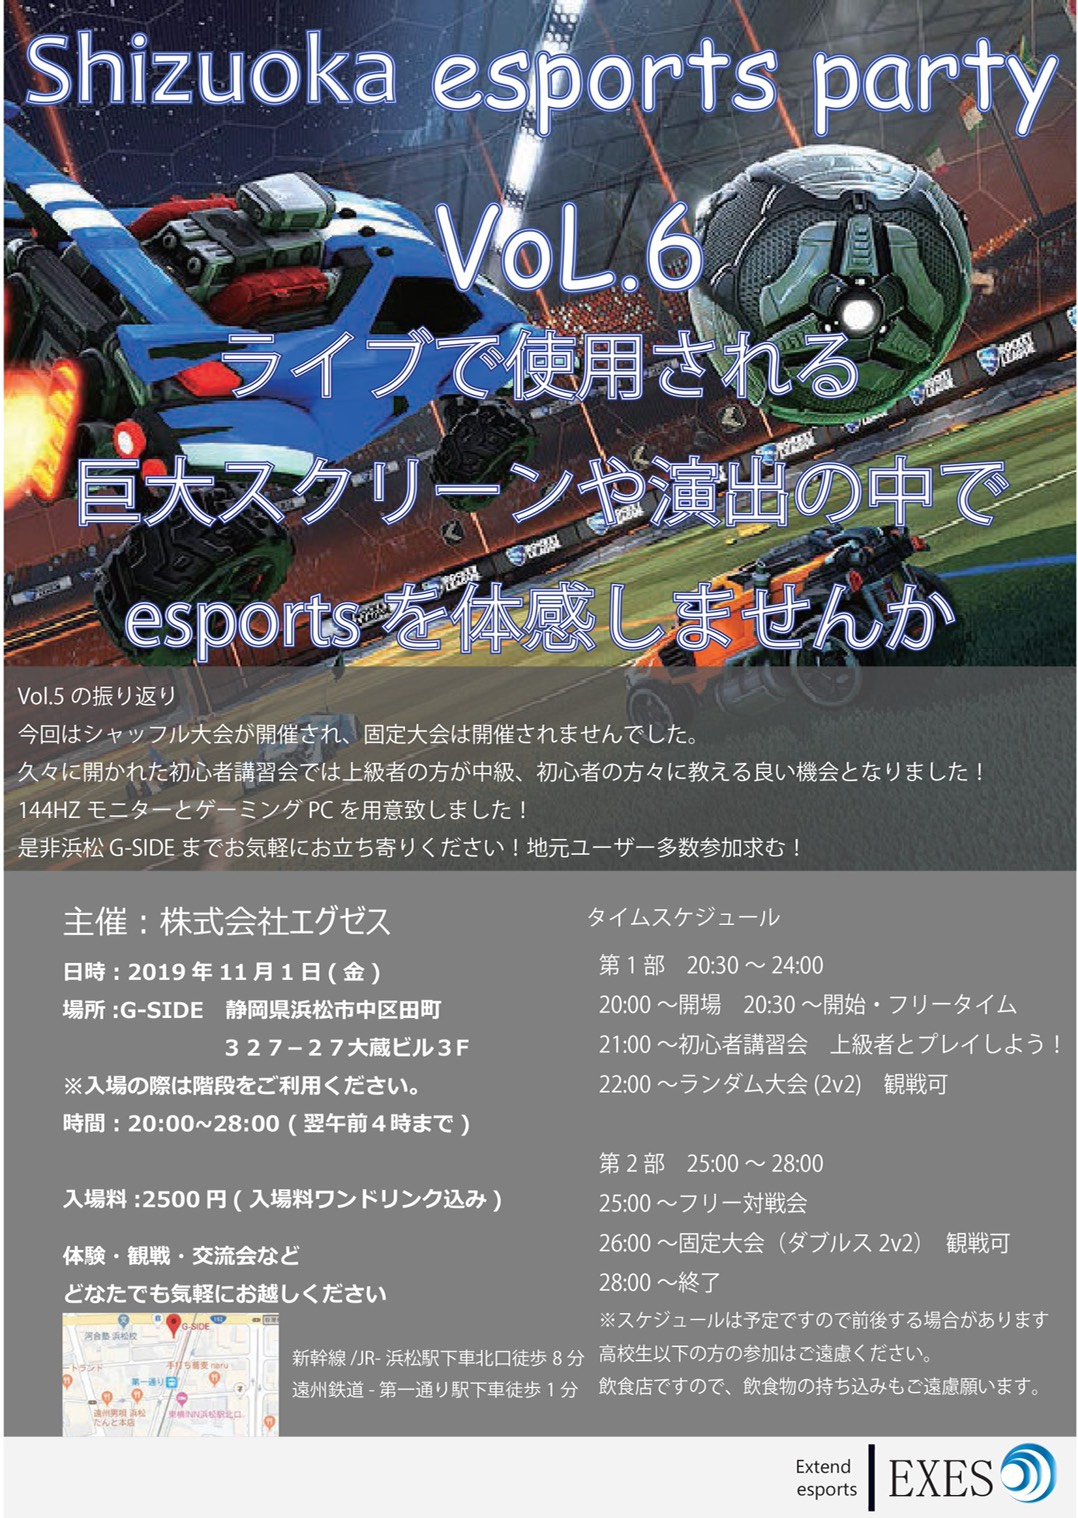 11月1日金曜日 Shizuoka esports party